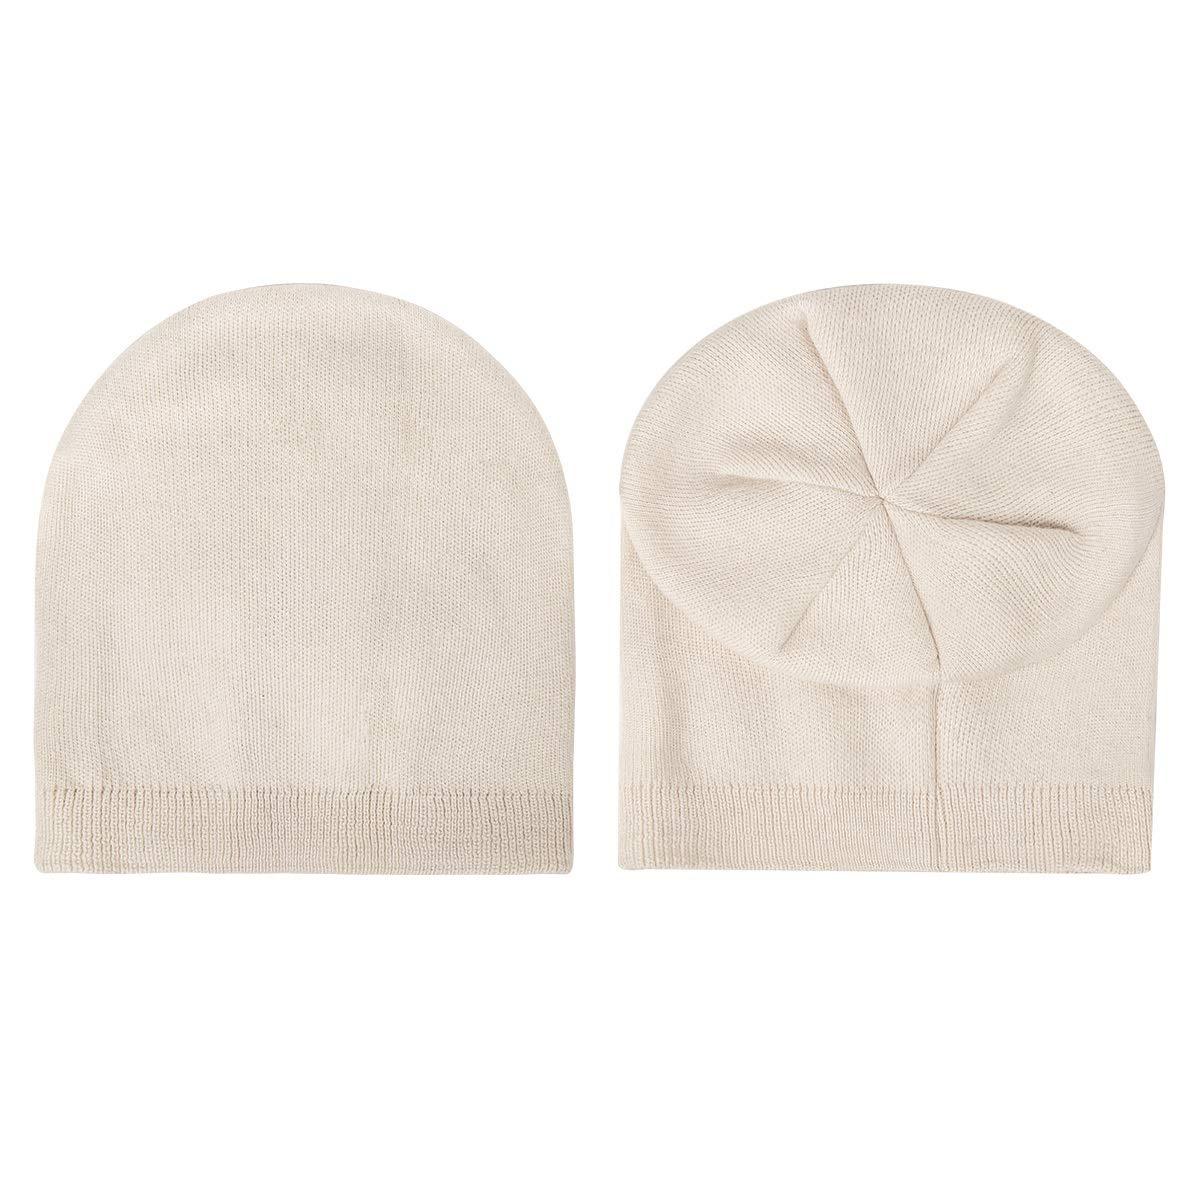 Winter Hats for Women yeabiu Soft Winter Beanies for Women Watch Cap Knit Wool Hat for Winter Fall